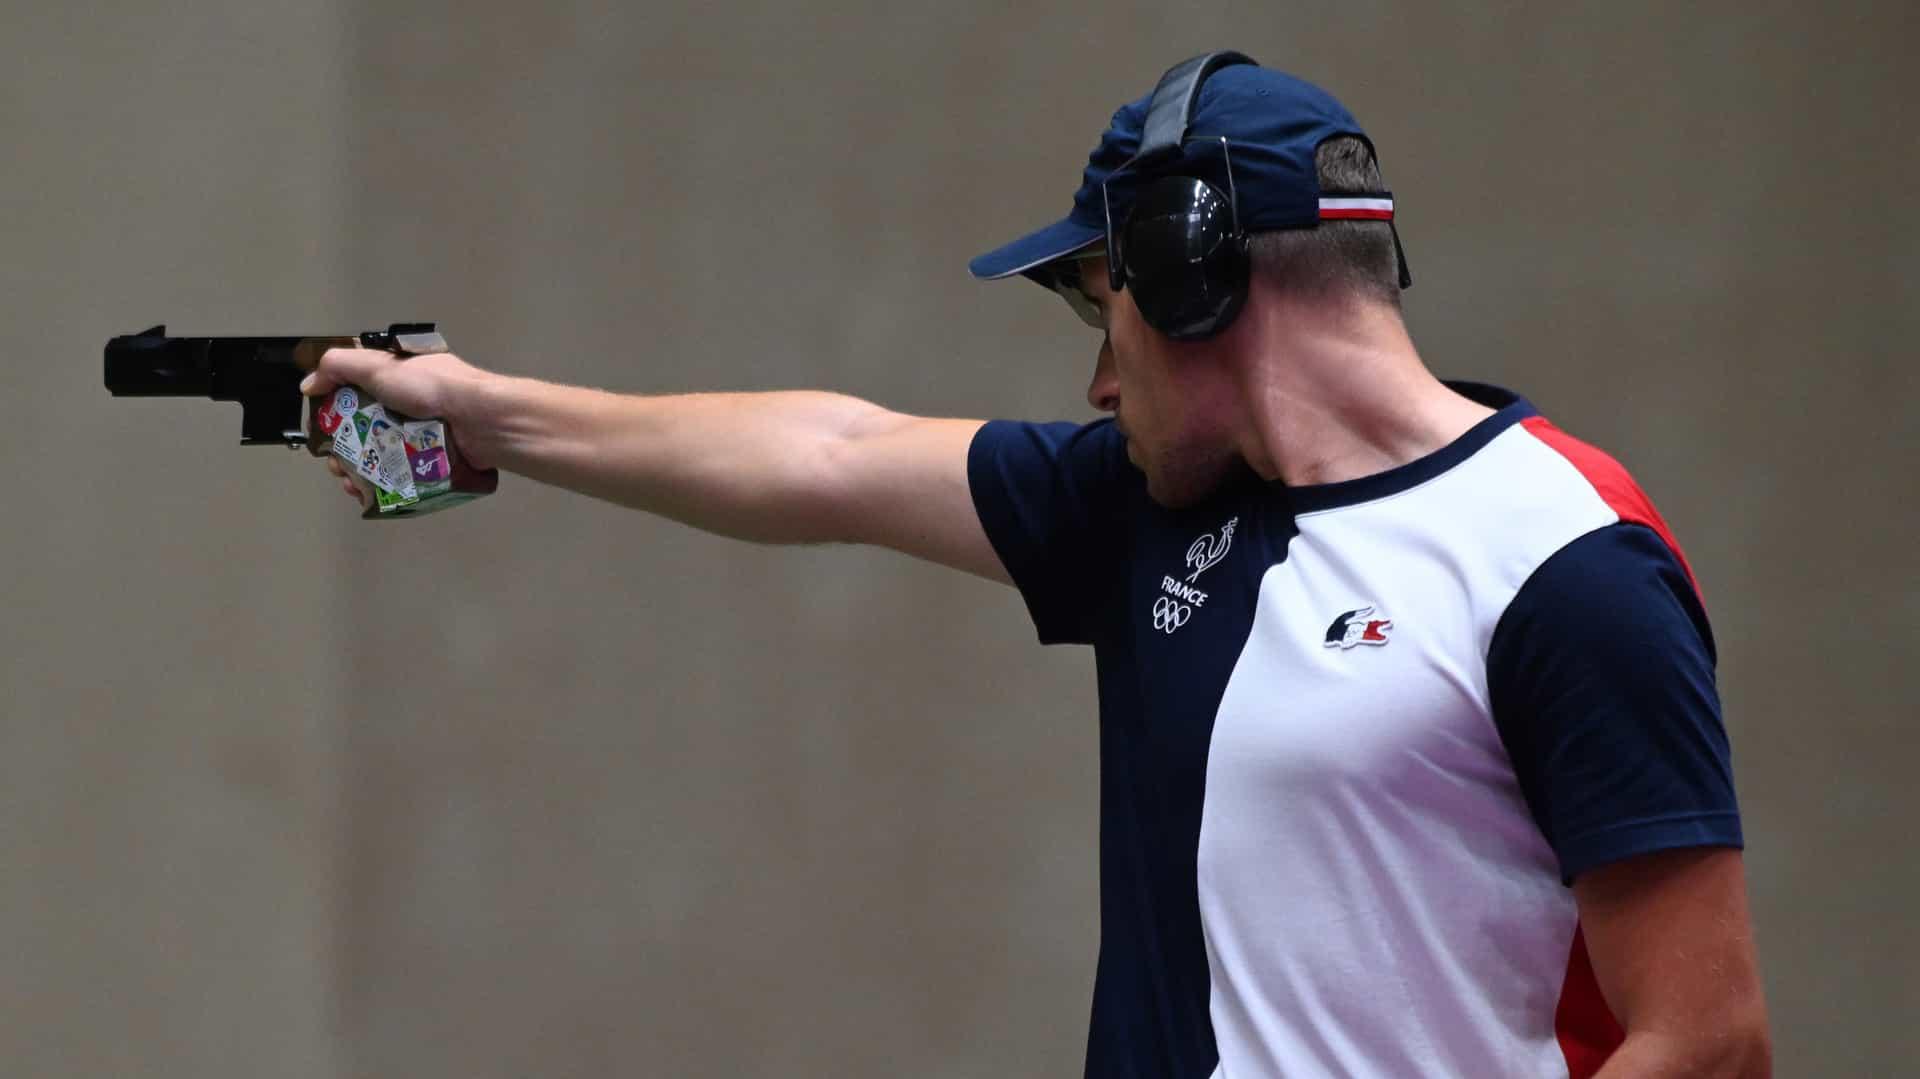 Jean Quiquampoix fires at targets in the men's rapid-fire pistol event. (credit: Swen Pförtner,...